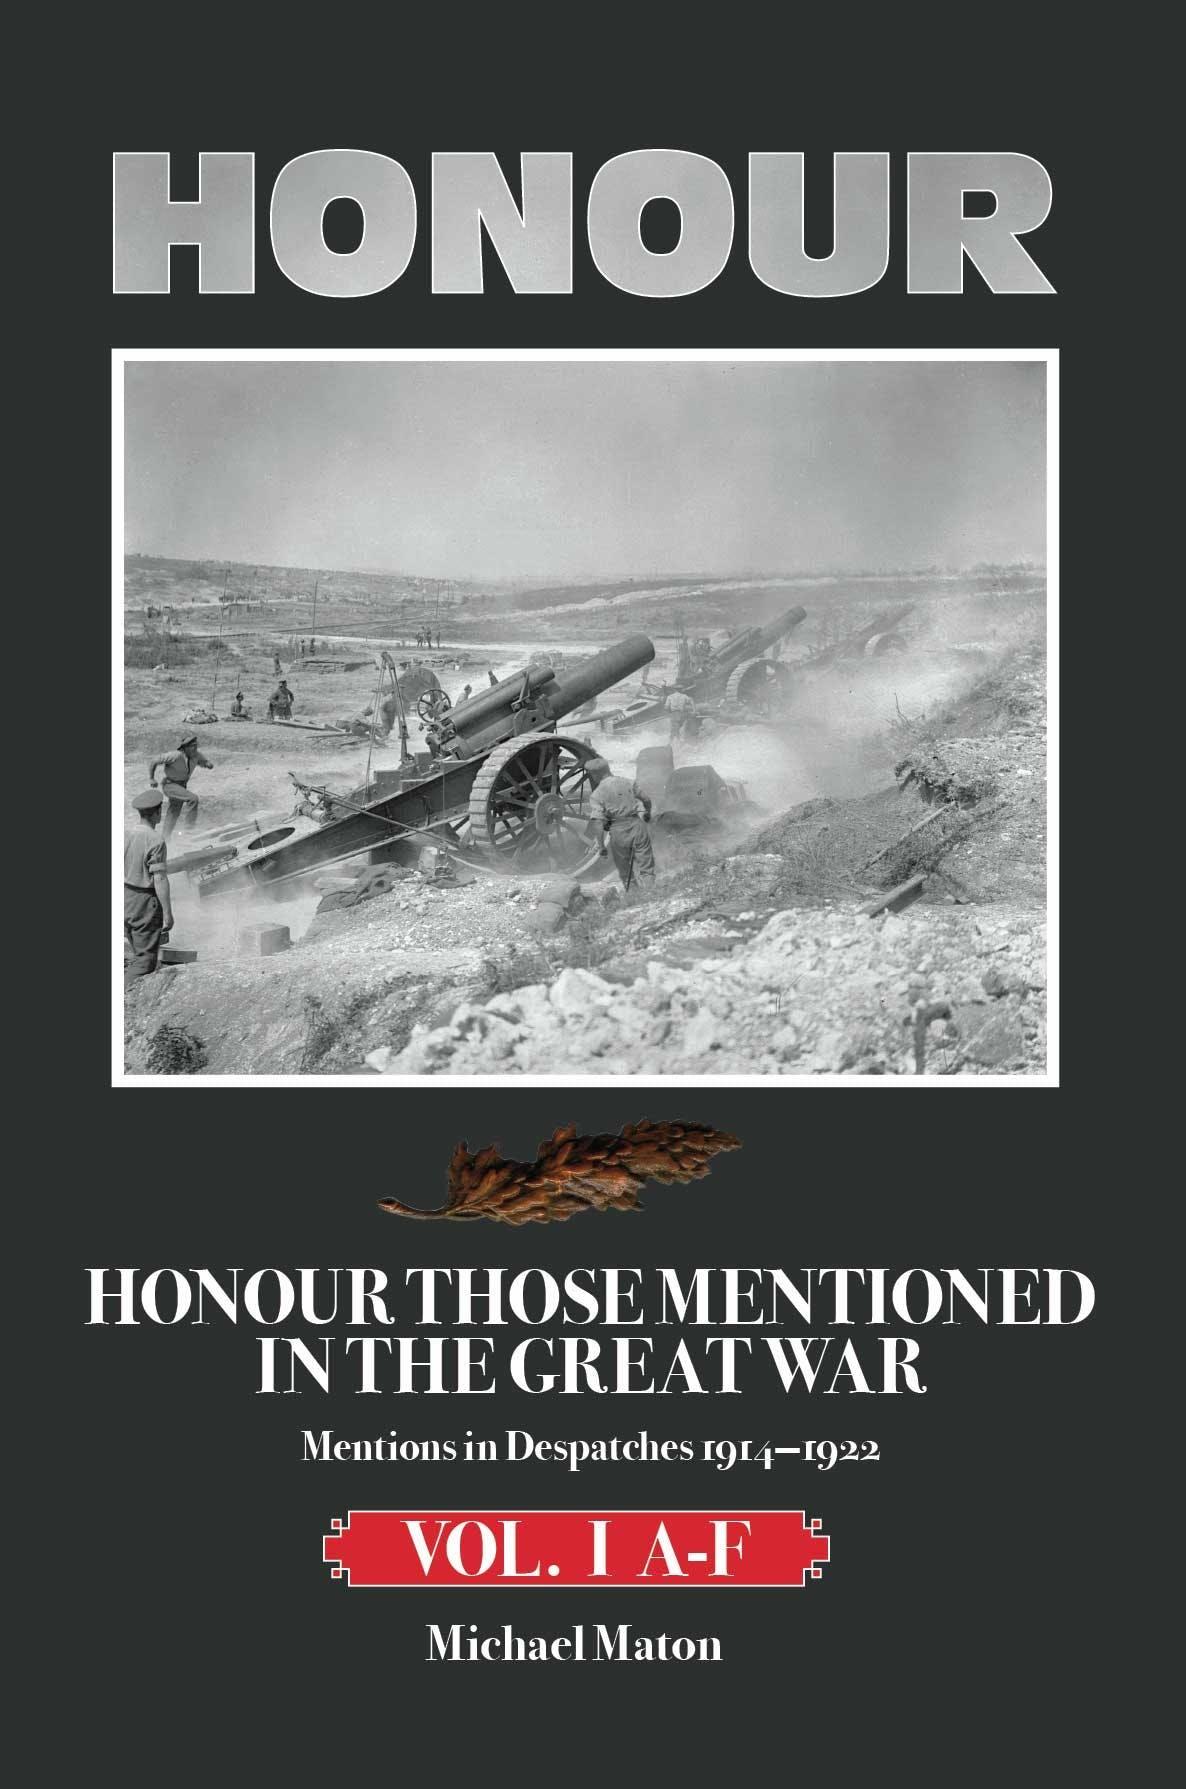 World War I MiDs Volume I in the Token Publishing Shop